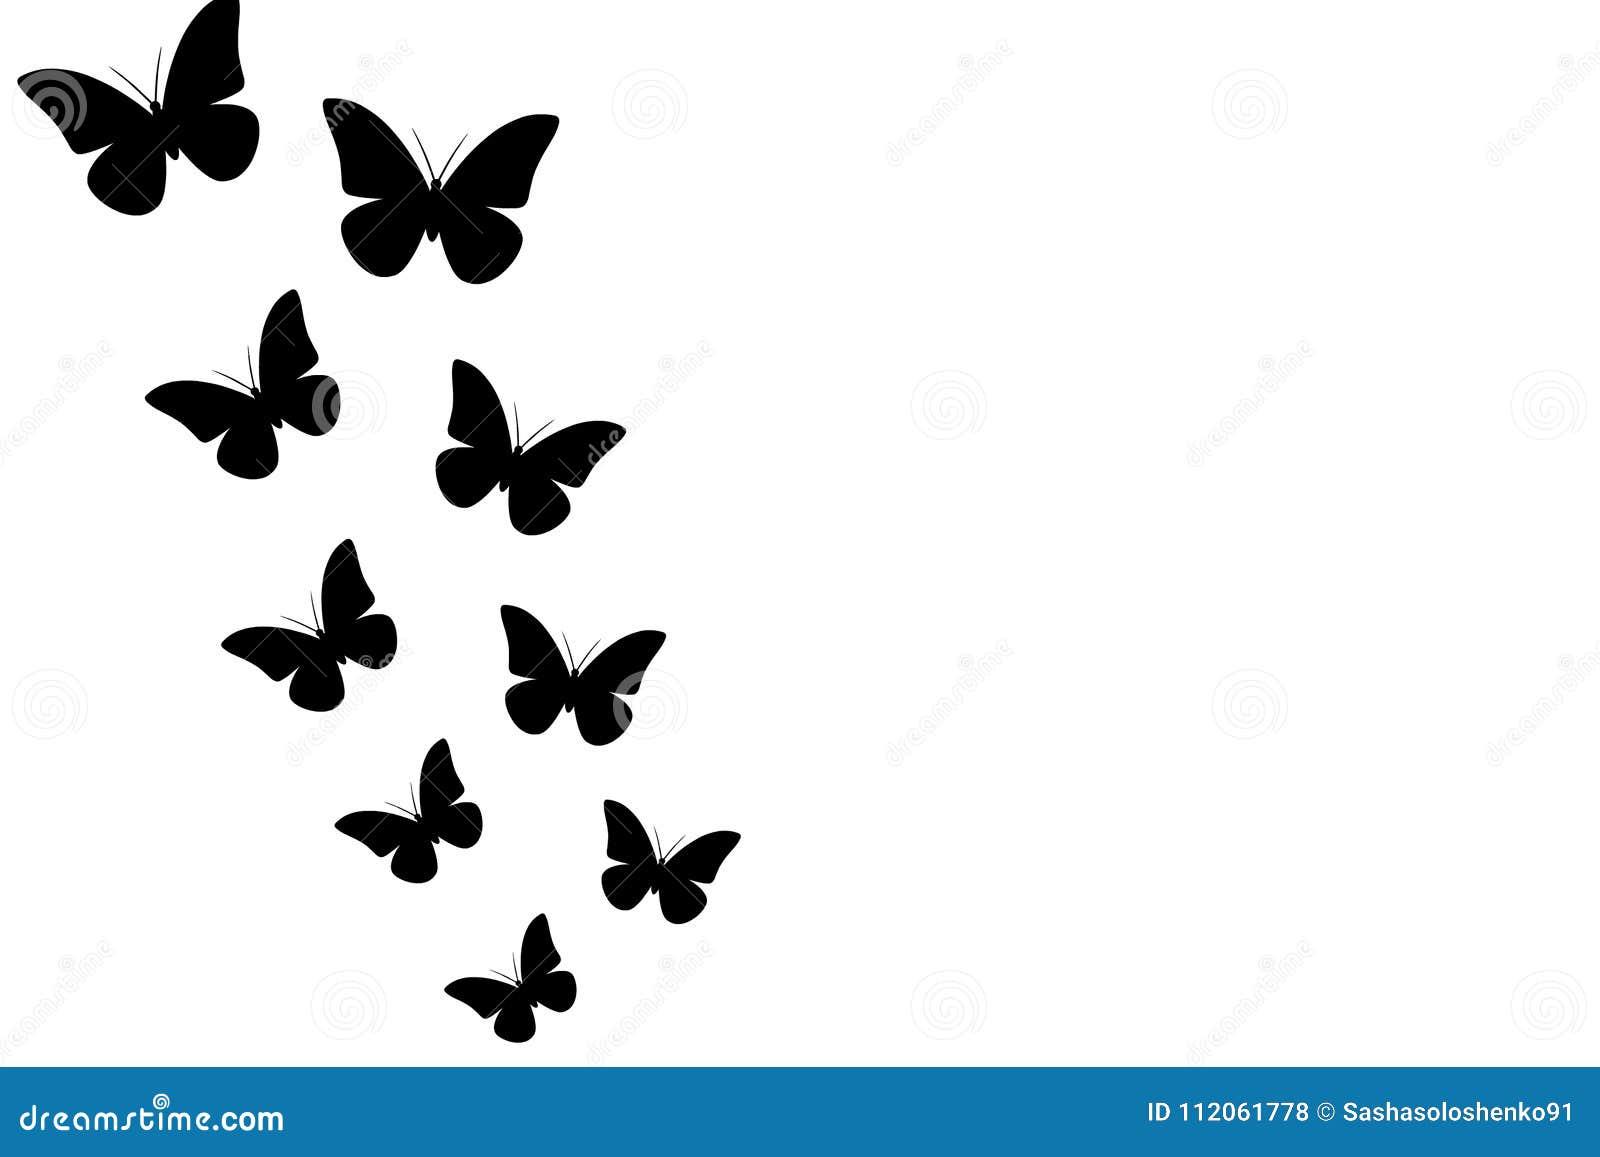 Black Butterflies On White Background Seamless Wallpaper Illustration Vector Stock Illustration Illustration Of Text Beautiful 112061778